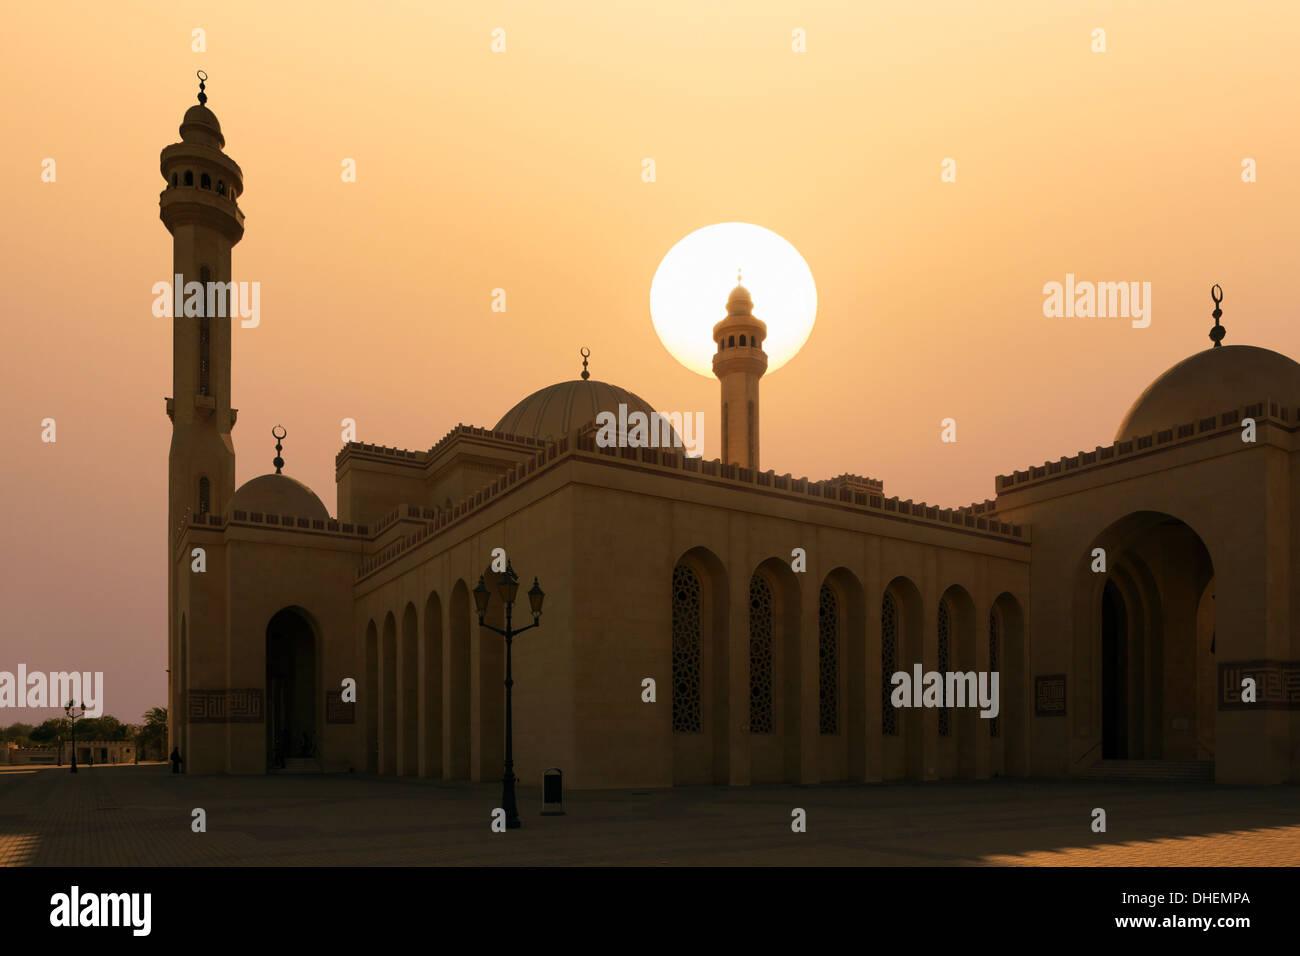 La Gran Mezquita Al Fateh, Manama, Bahrein, Oriente Medio Imagen De Stock